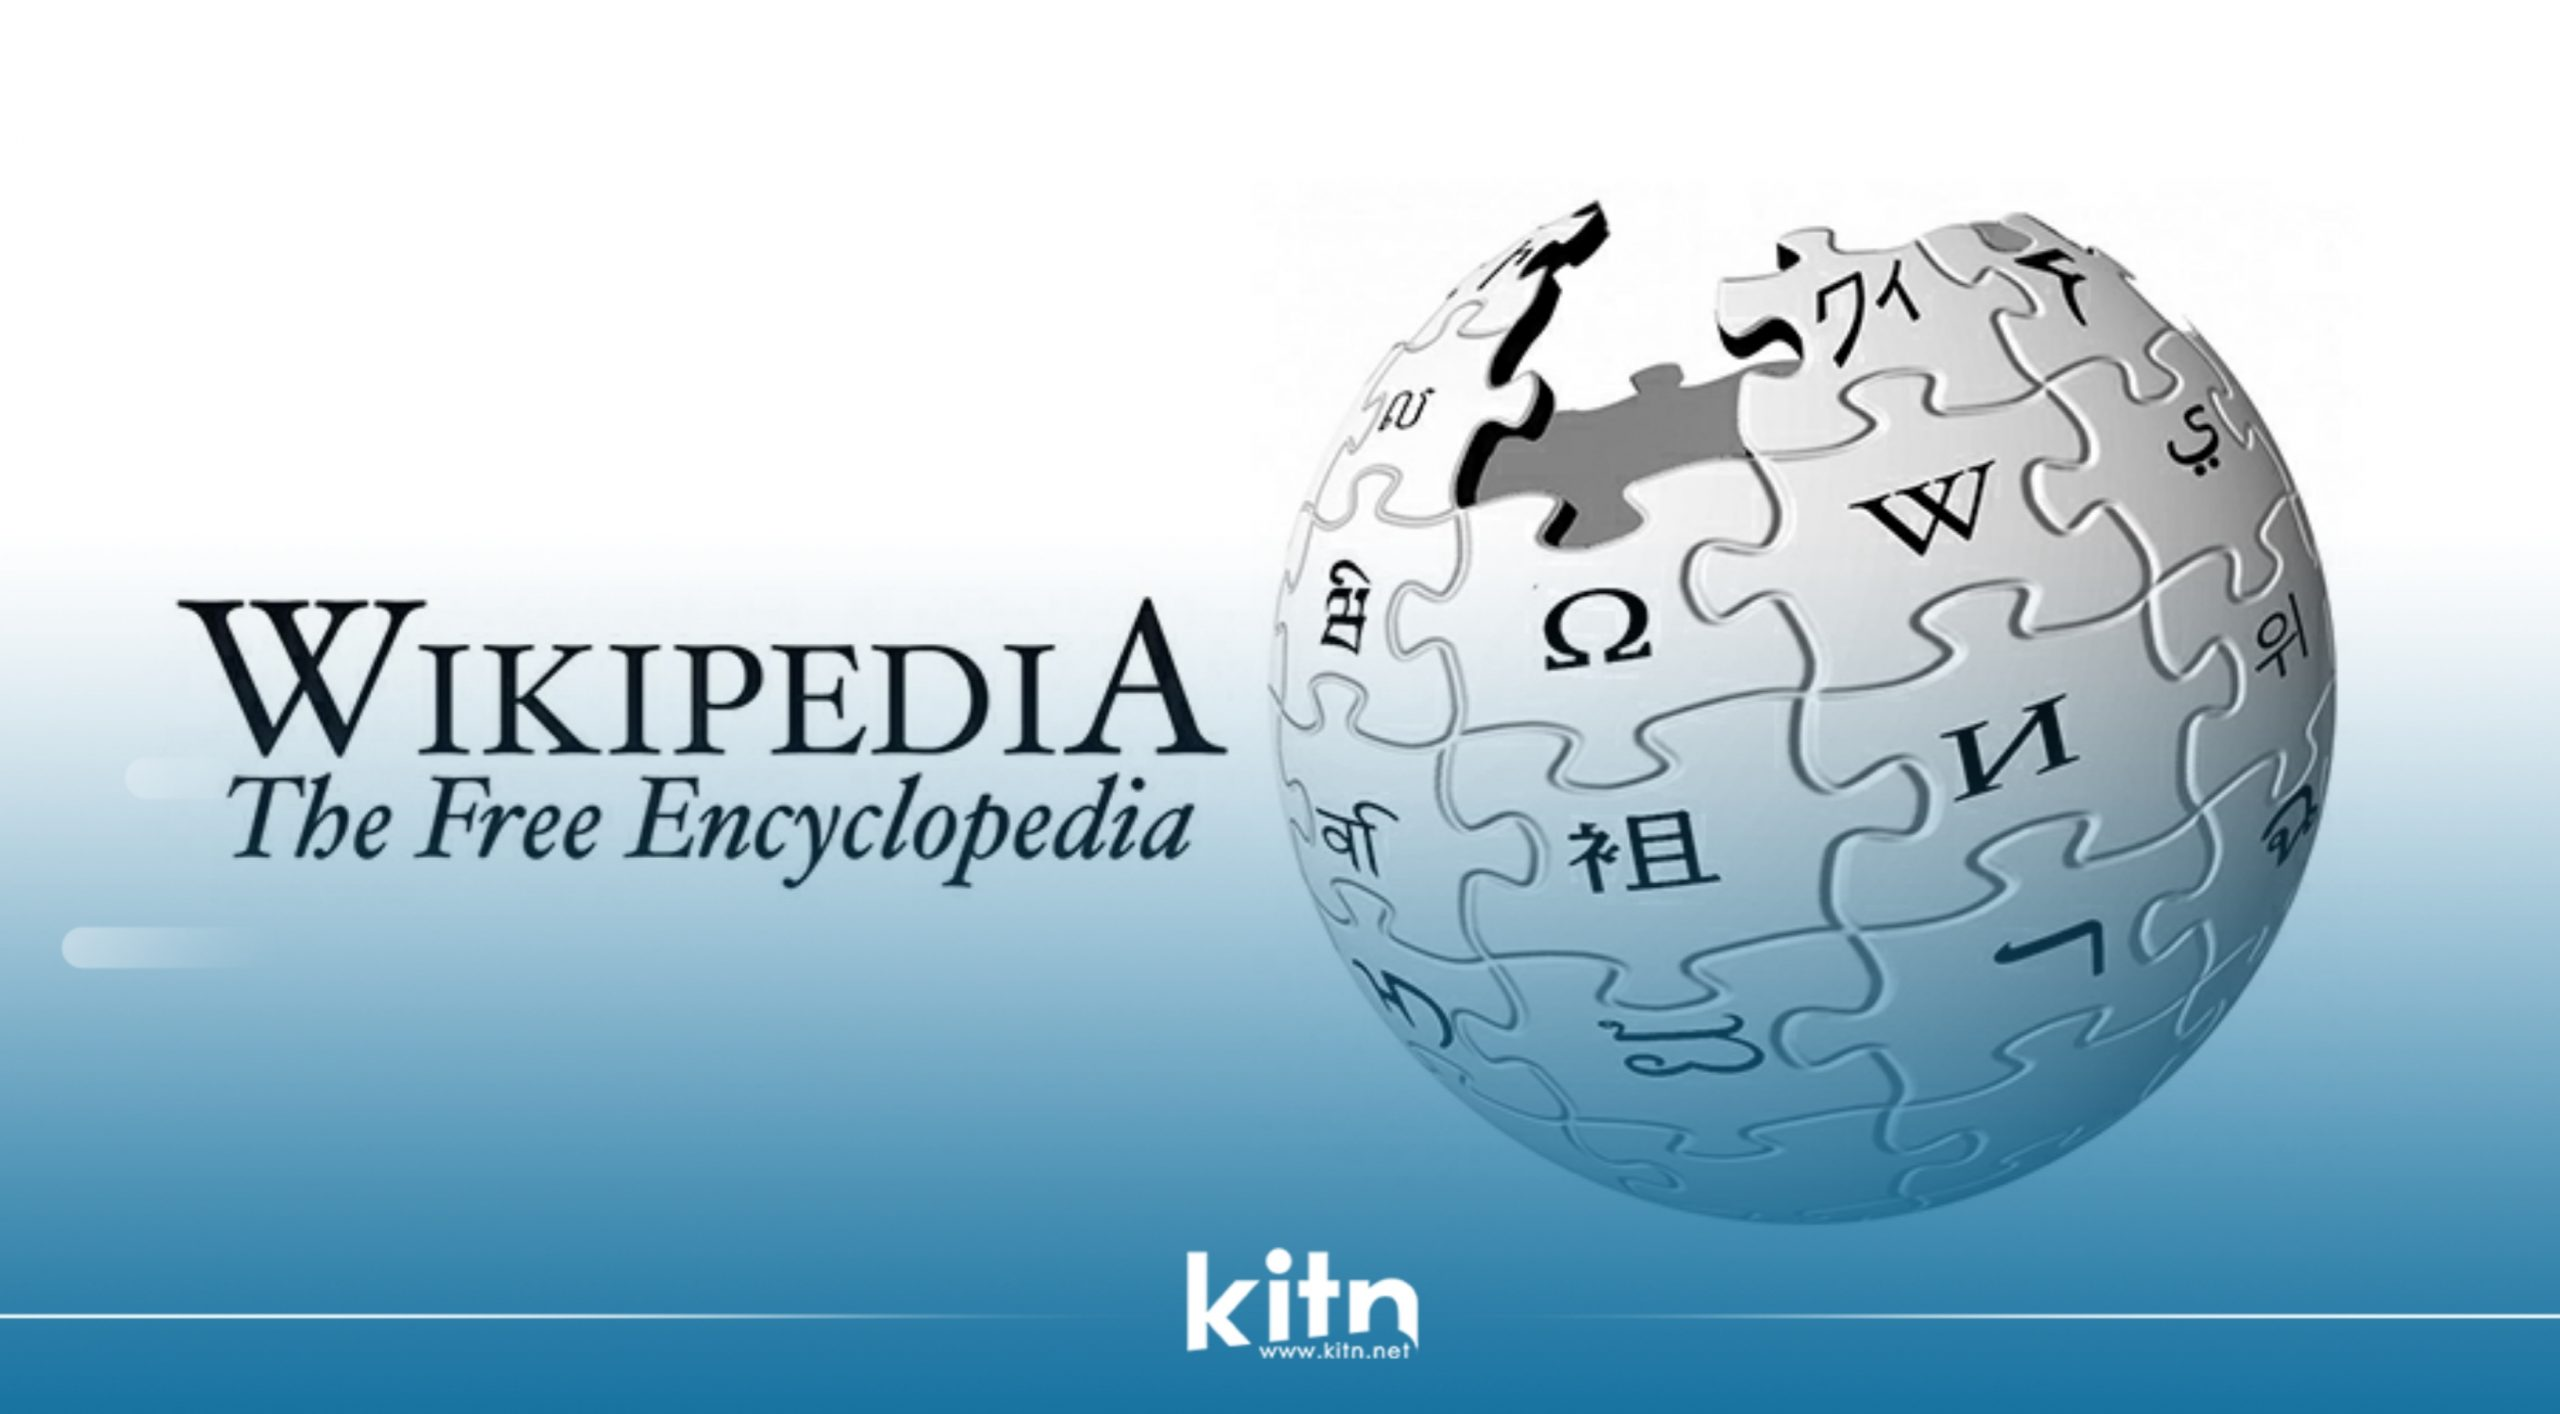 ماڵپەڕی Wikipedia دوای دە ساڵ بۆ Desktop دیزاین دەکرێتەوە